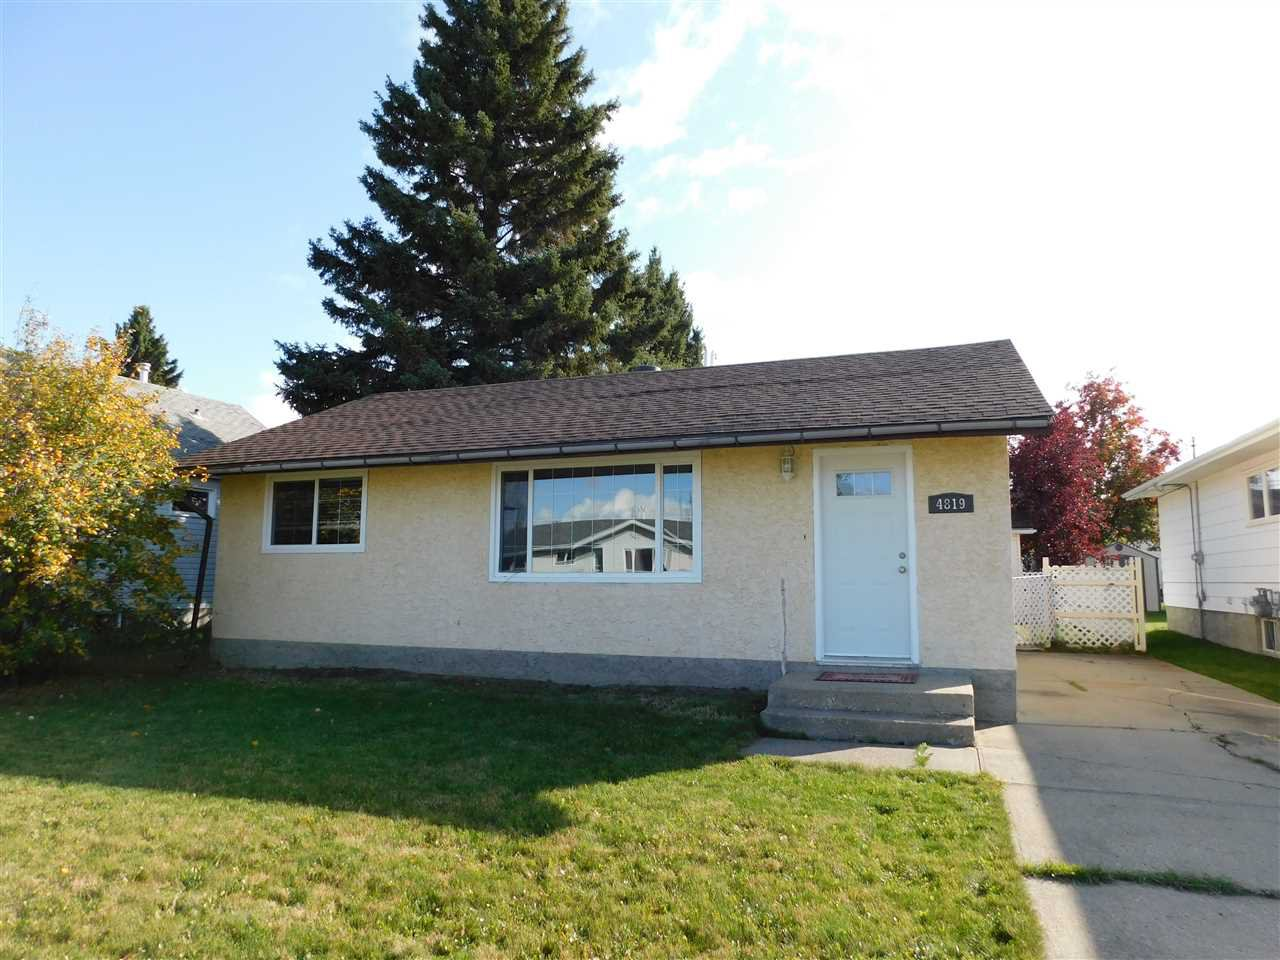 Main Photo: 4819 50 Street: Gibbons House for sale : MLS®# E4175344